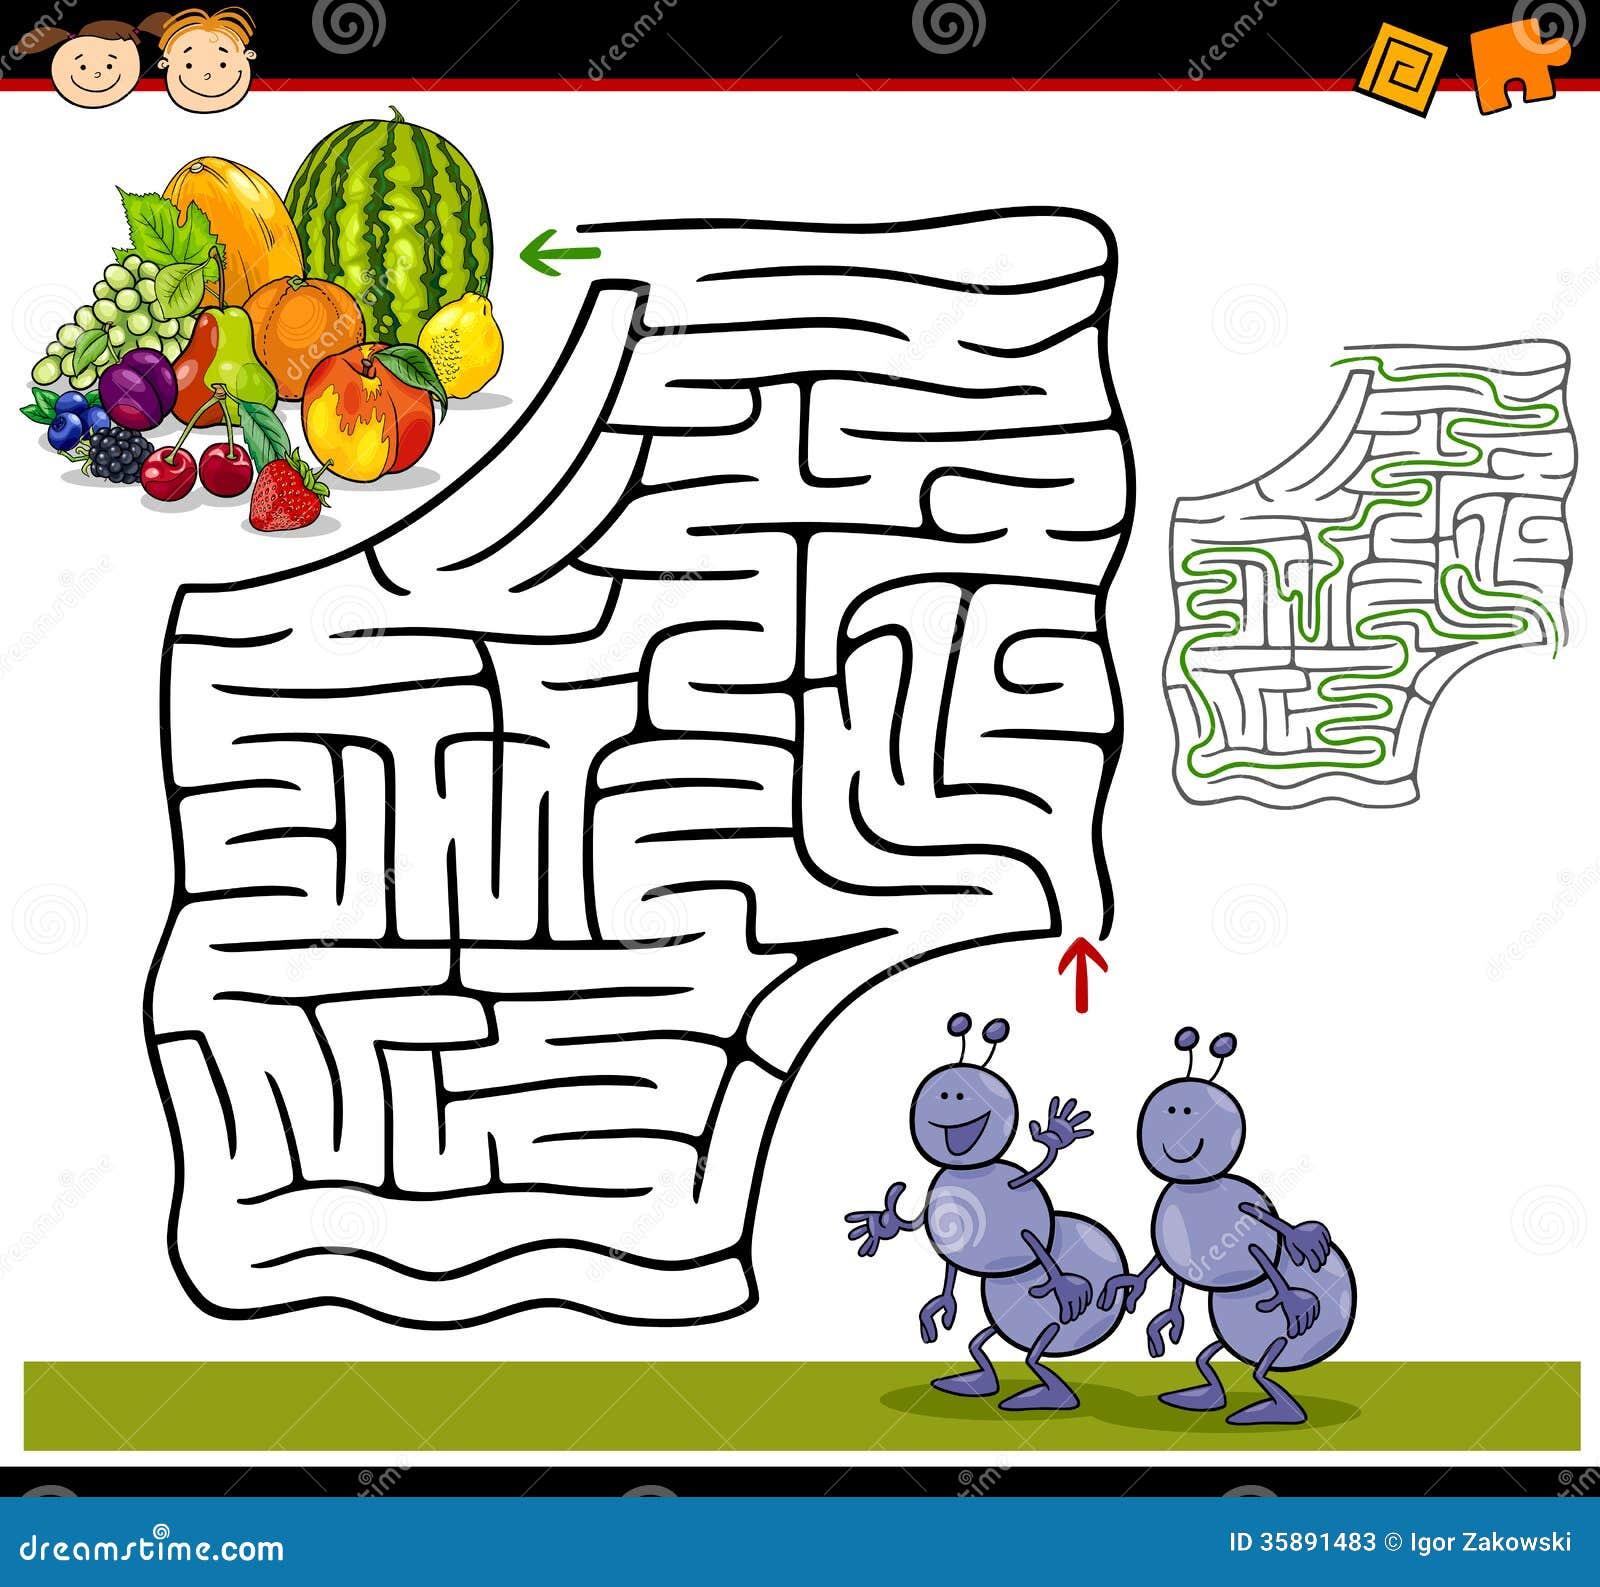 Cartoon Maze Or Labyrinth Game Stock Photos - Image: 35891483